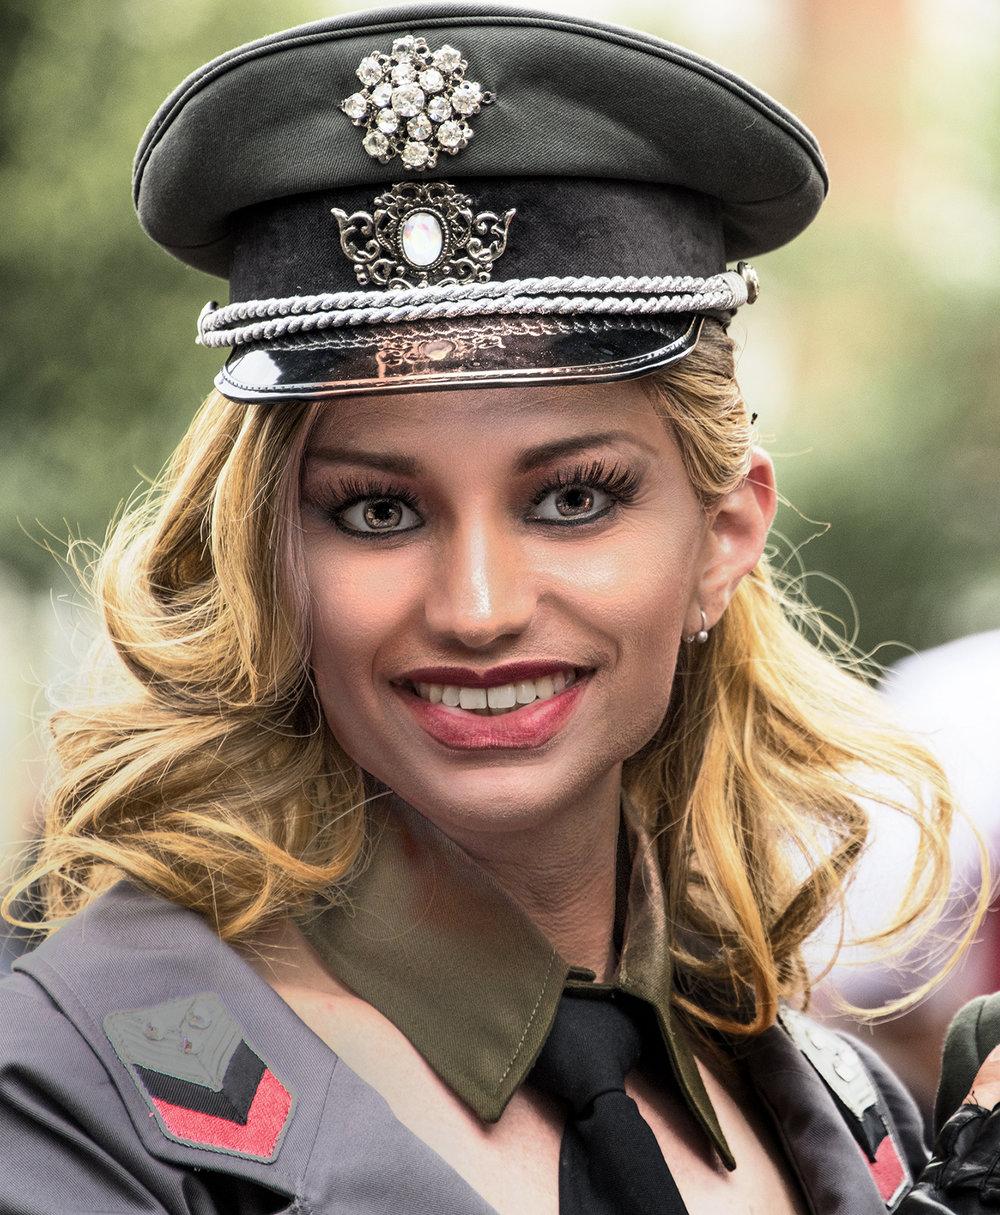 45_MICHAEL_WINTERS_VIENNA_PARADE_PARTICIPANT_LGBT_MARCHER_1.JPG